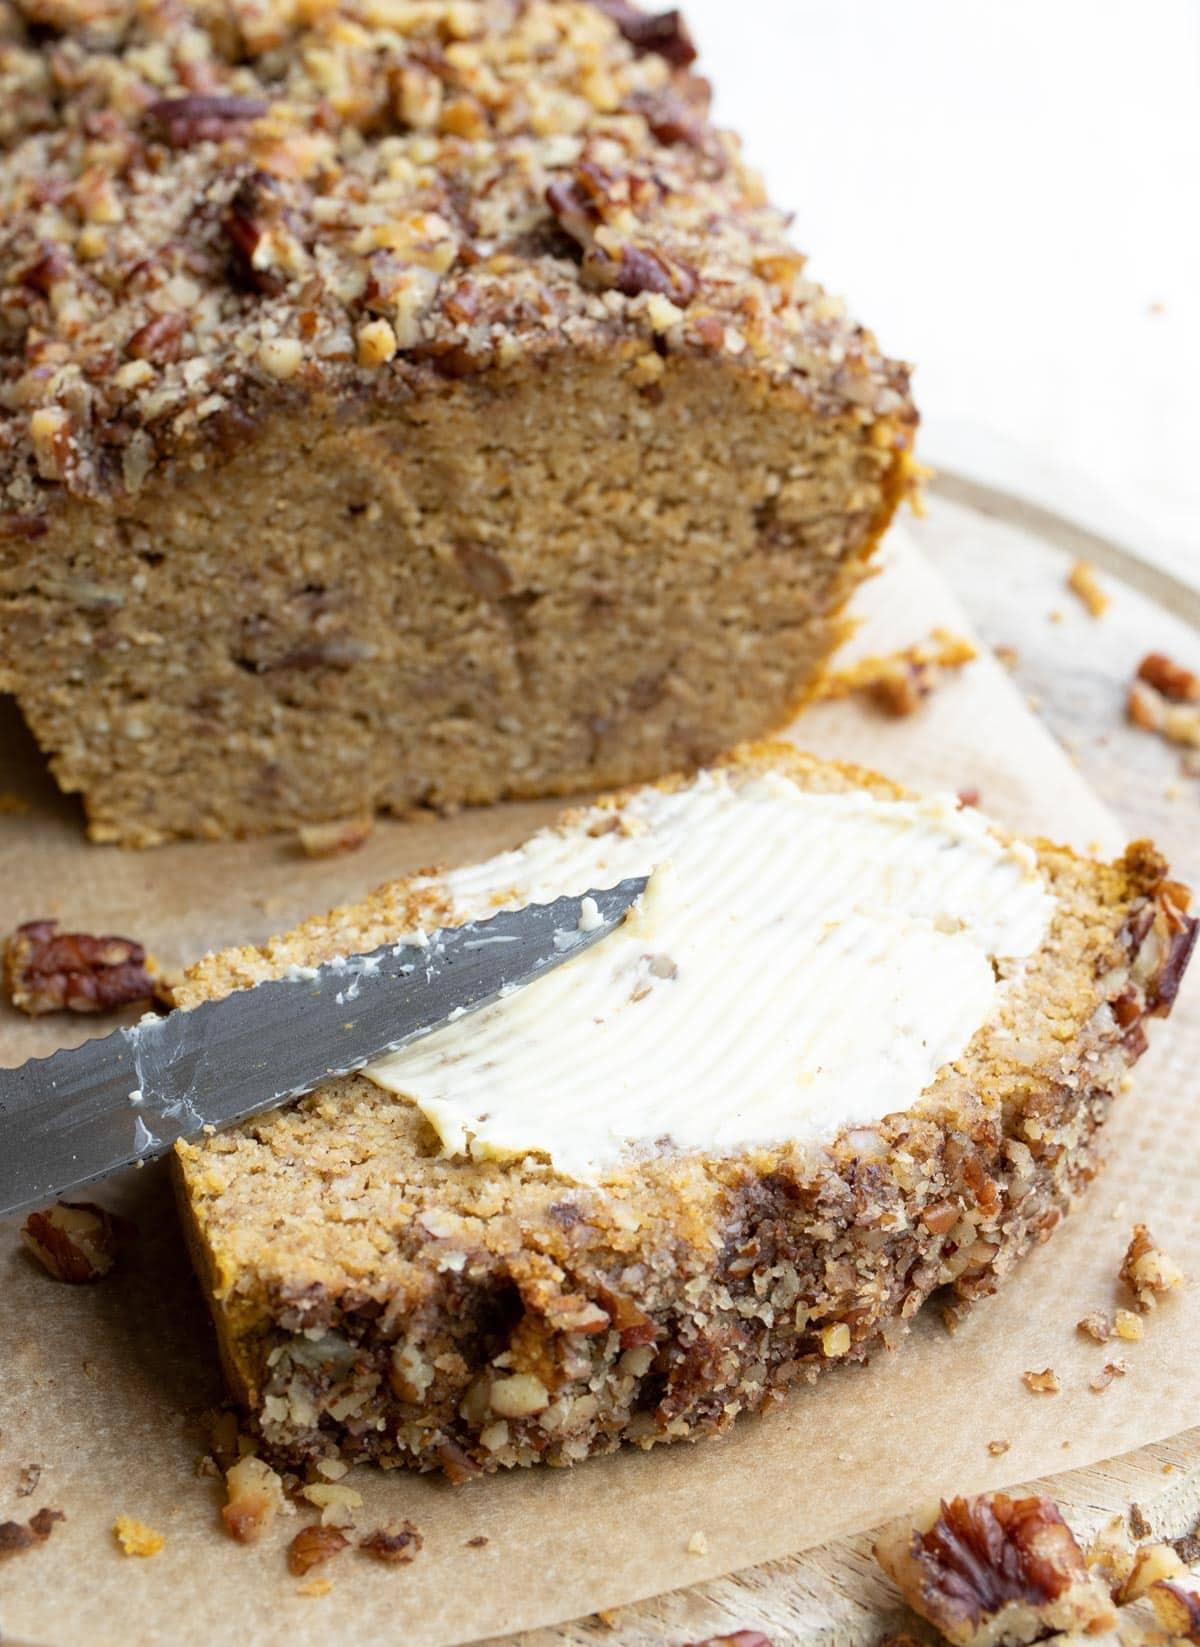 spreading butter onto a slice of pumpkin bread